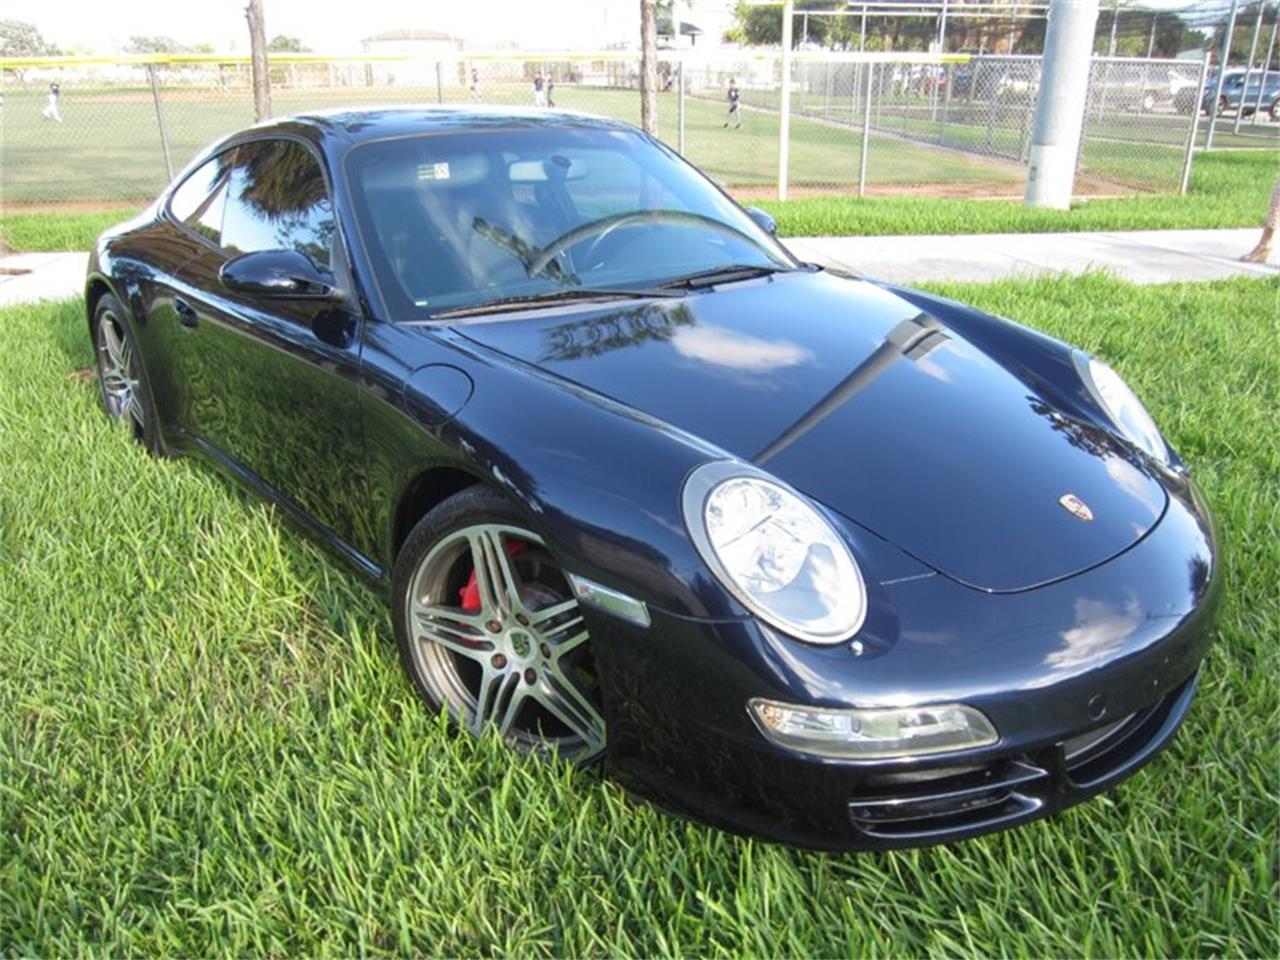 2008 Porsche 911 Carrera S (CC-1412885) for sale in Delray Beach, Florida